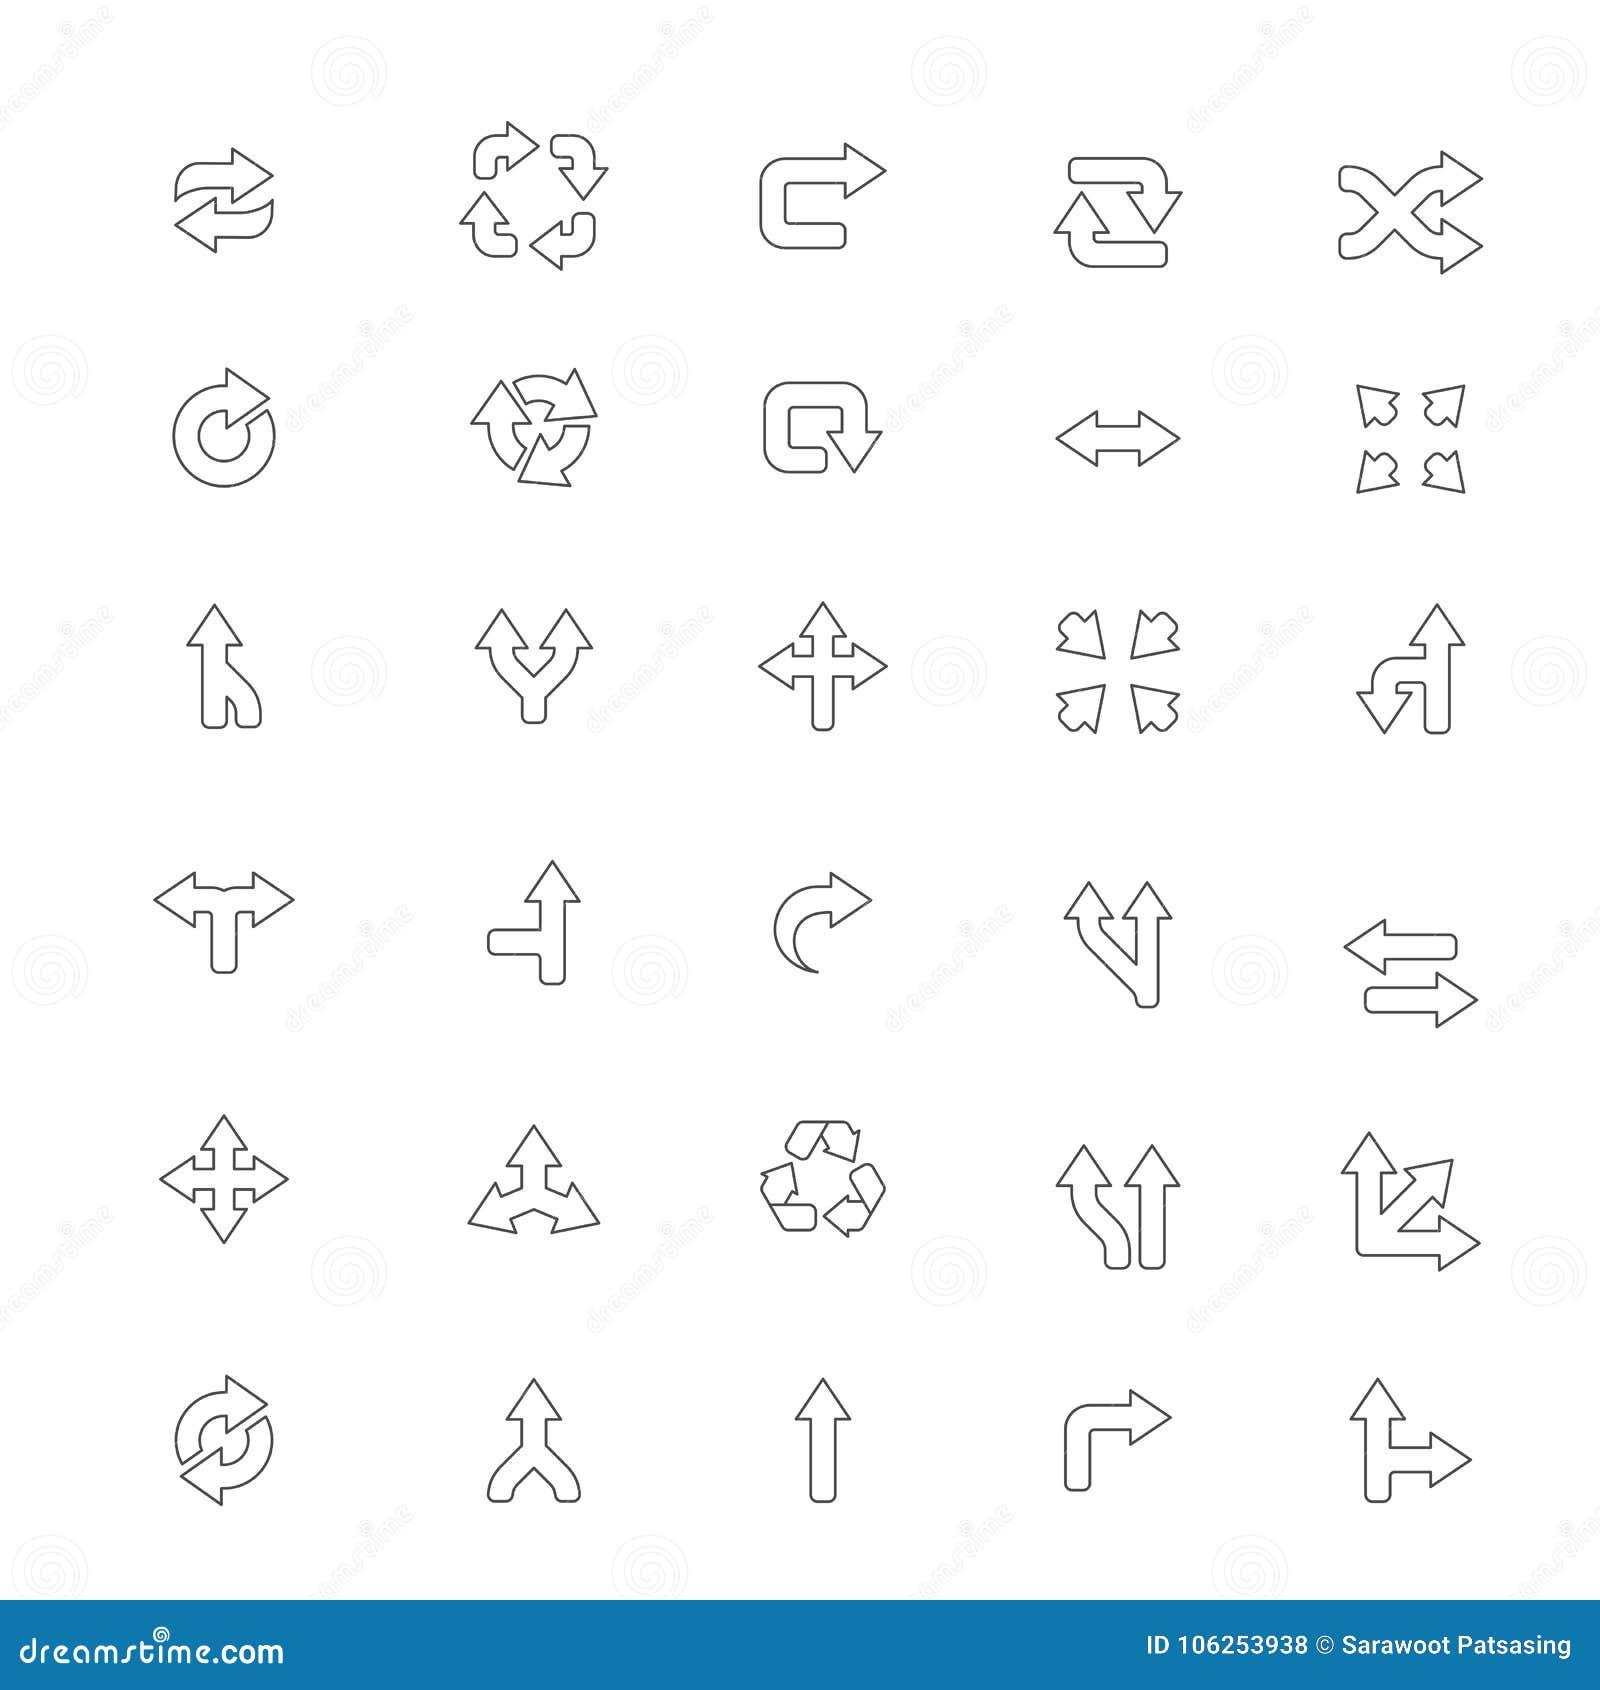 Arrows Icon On White Background Illustrator Stock Illustration